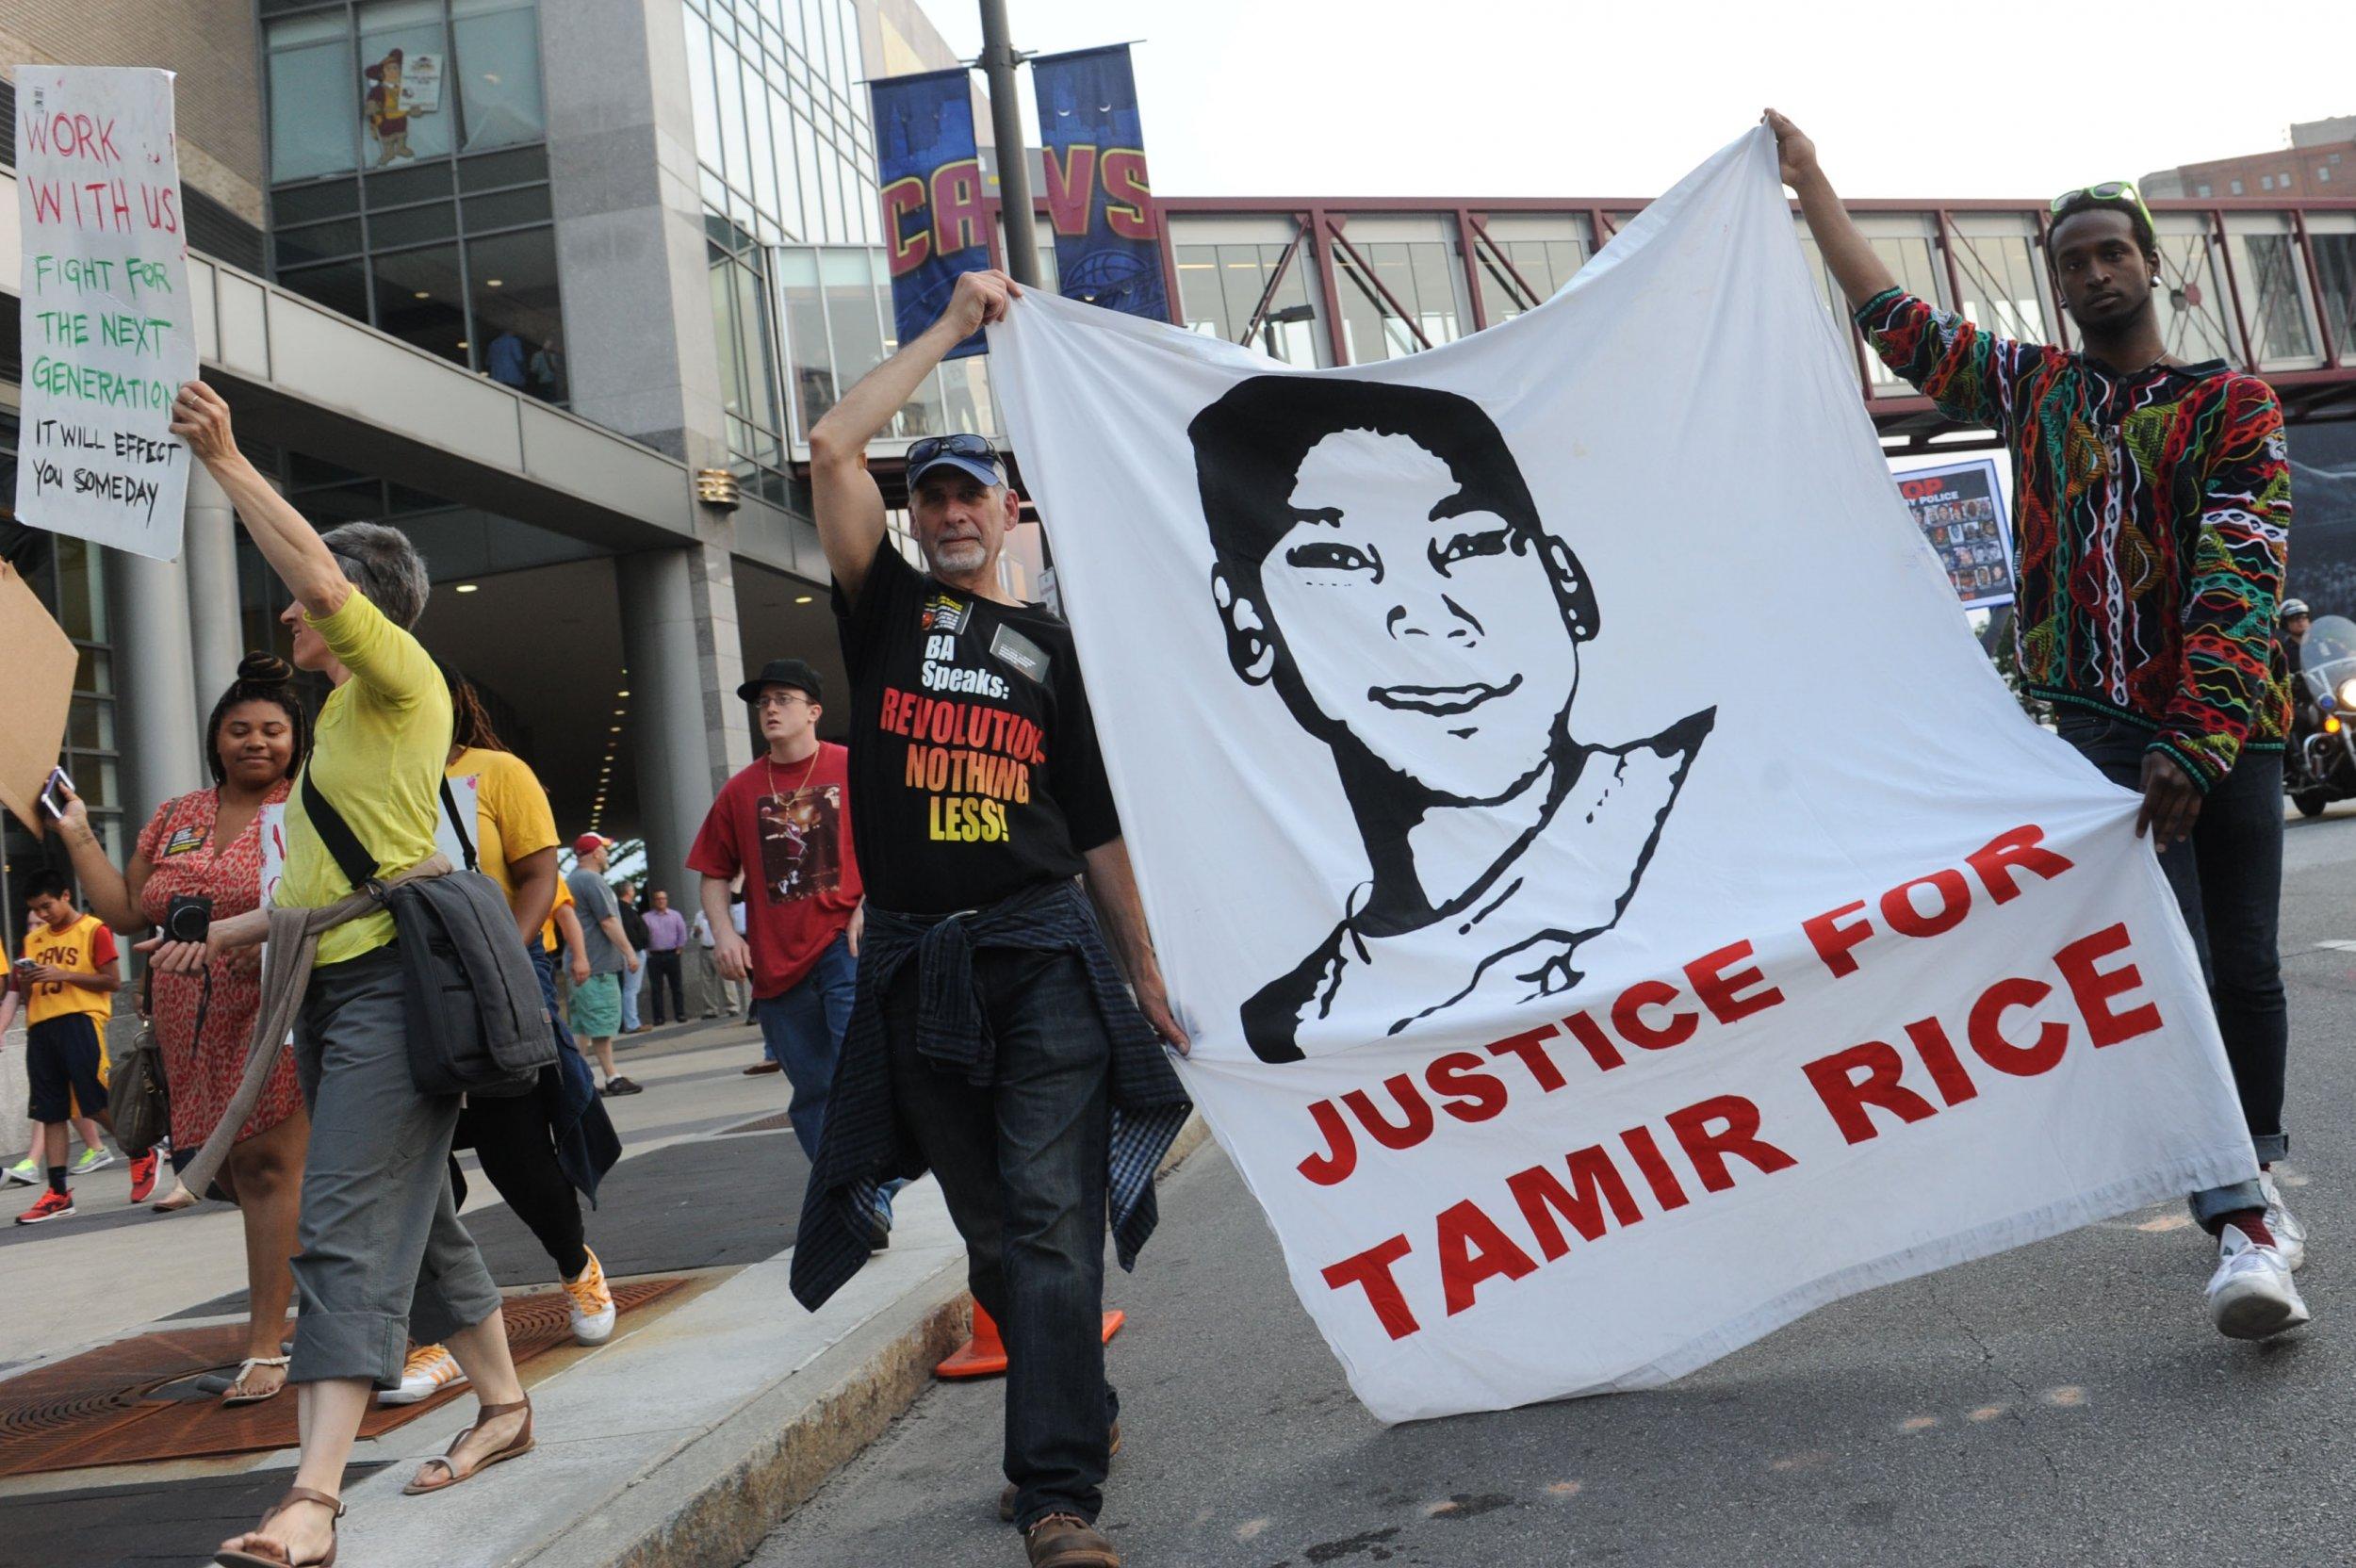 11_22_Tamir_Rice_Protest